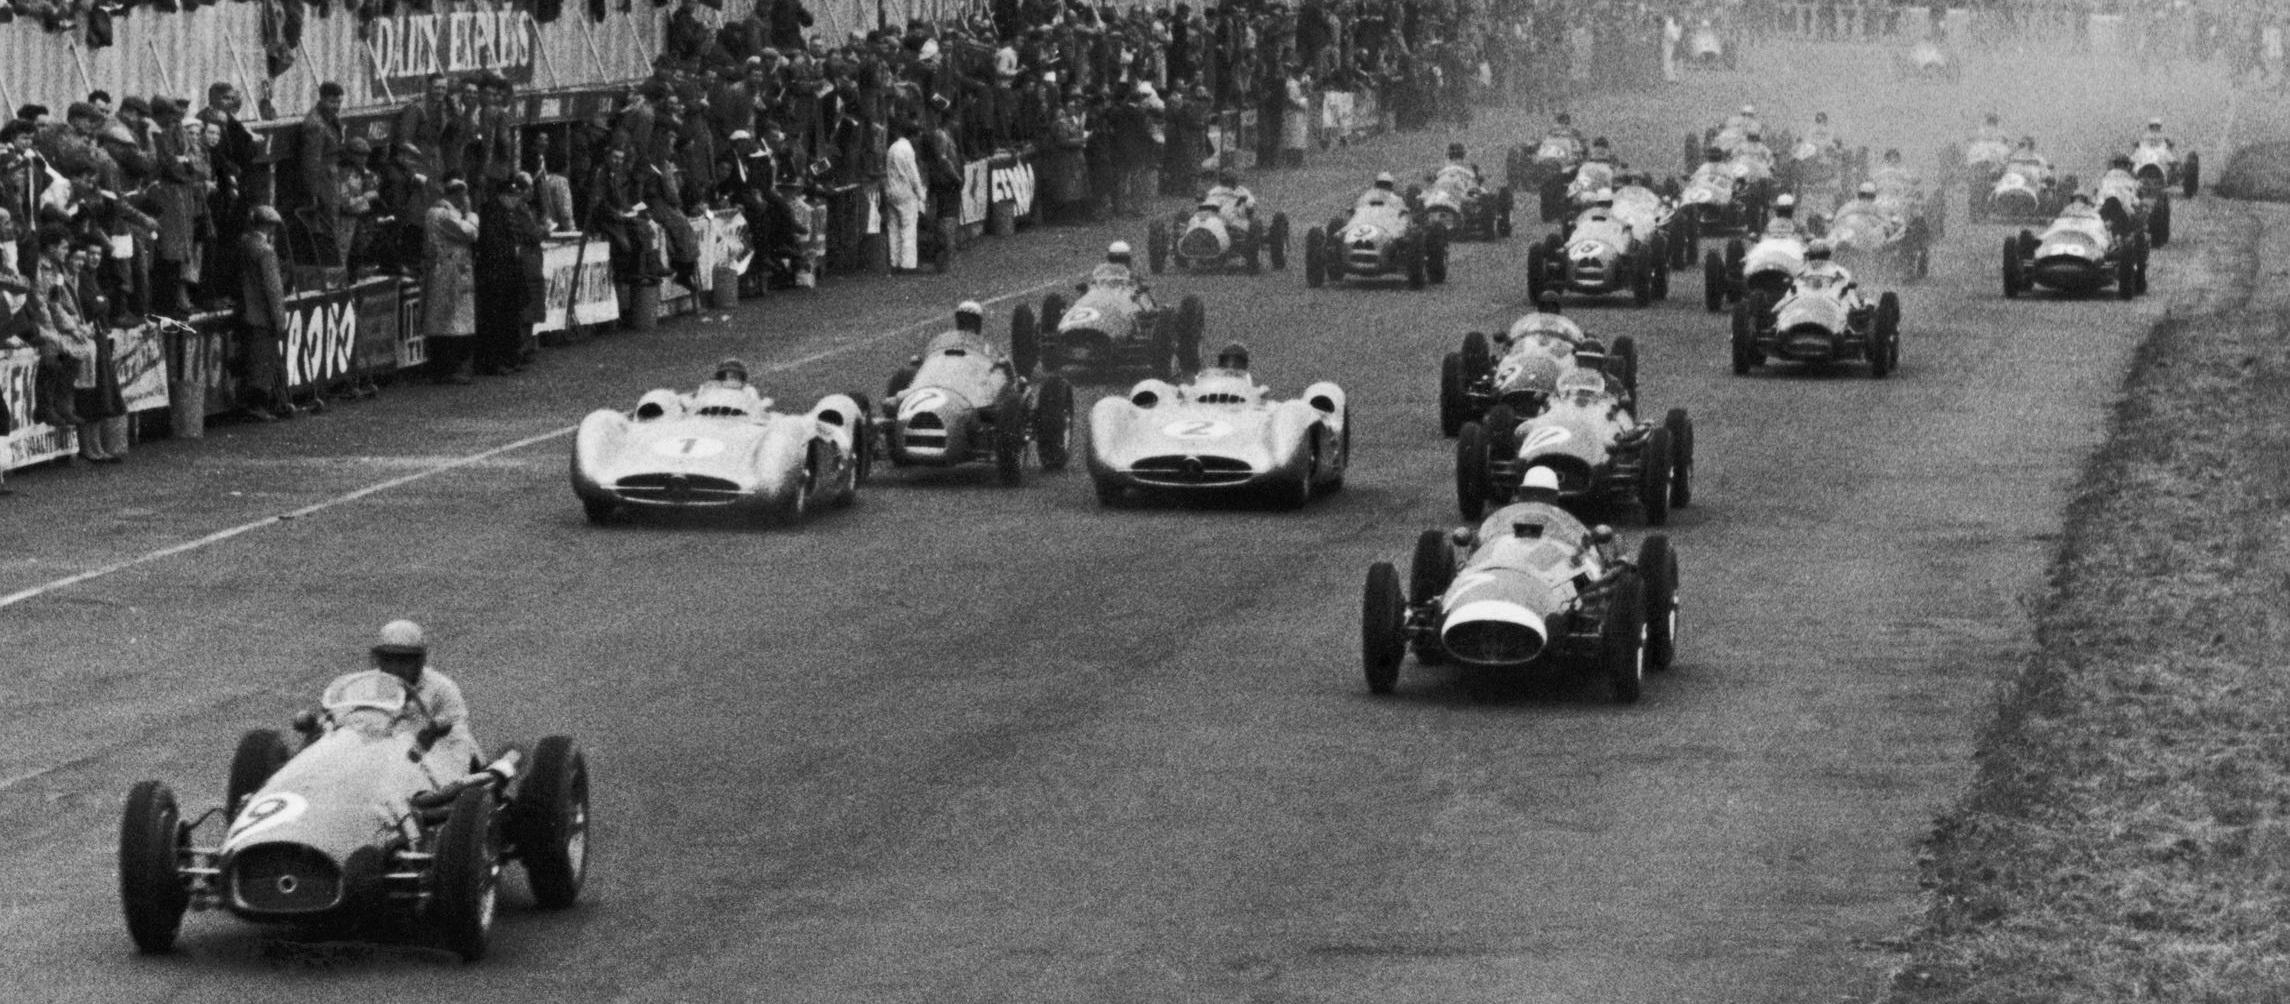 Salida GP Gran Bretaña 1954